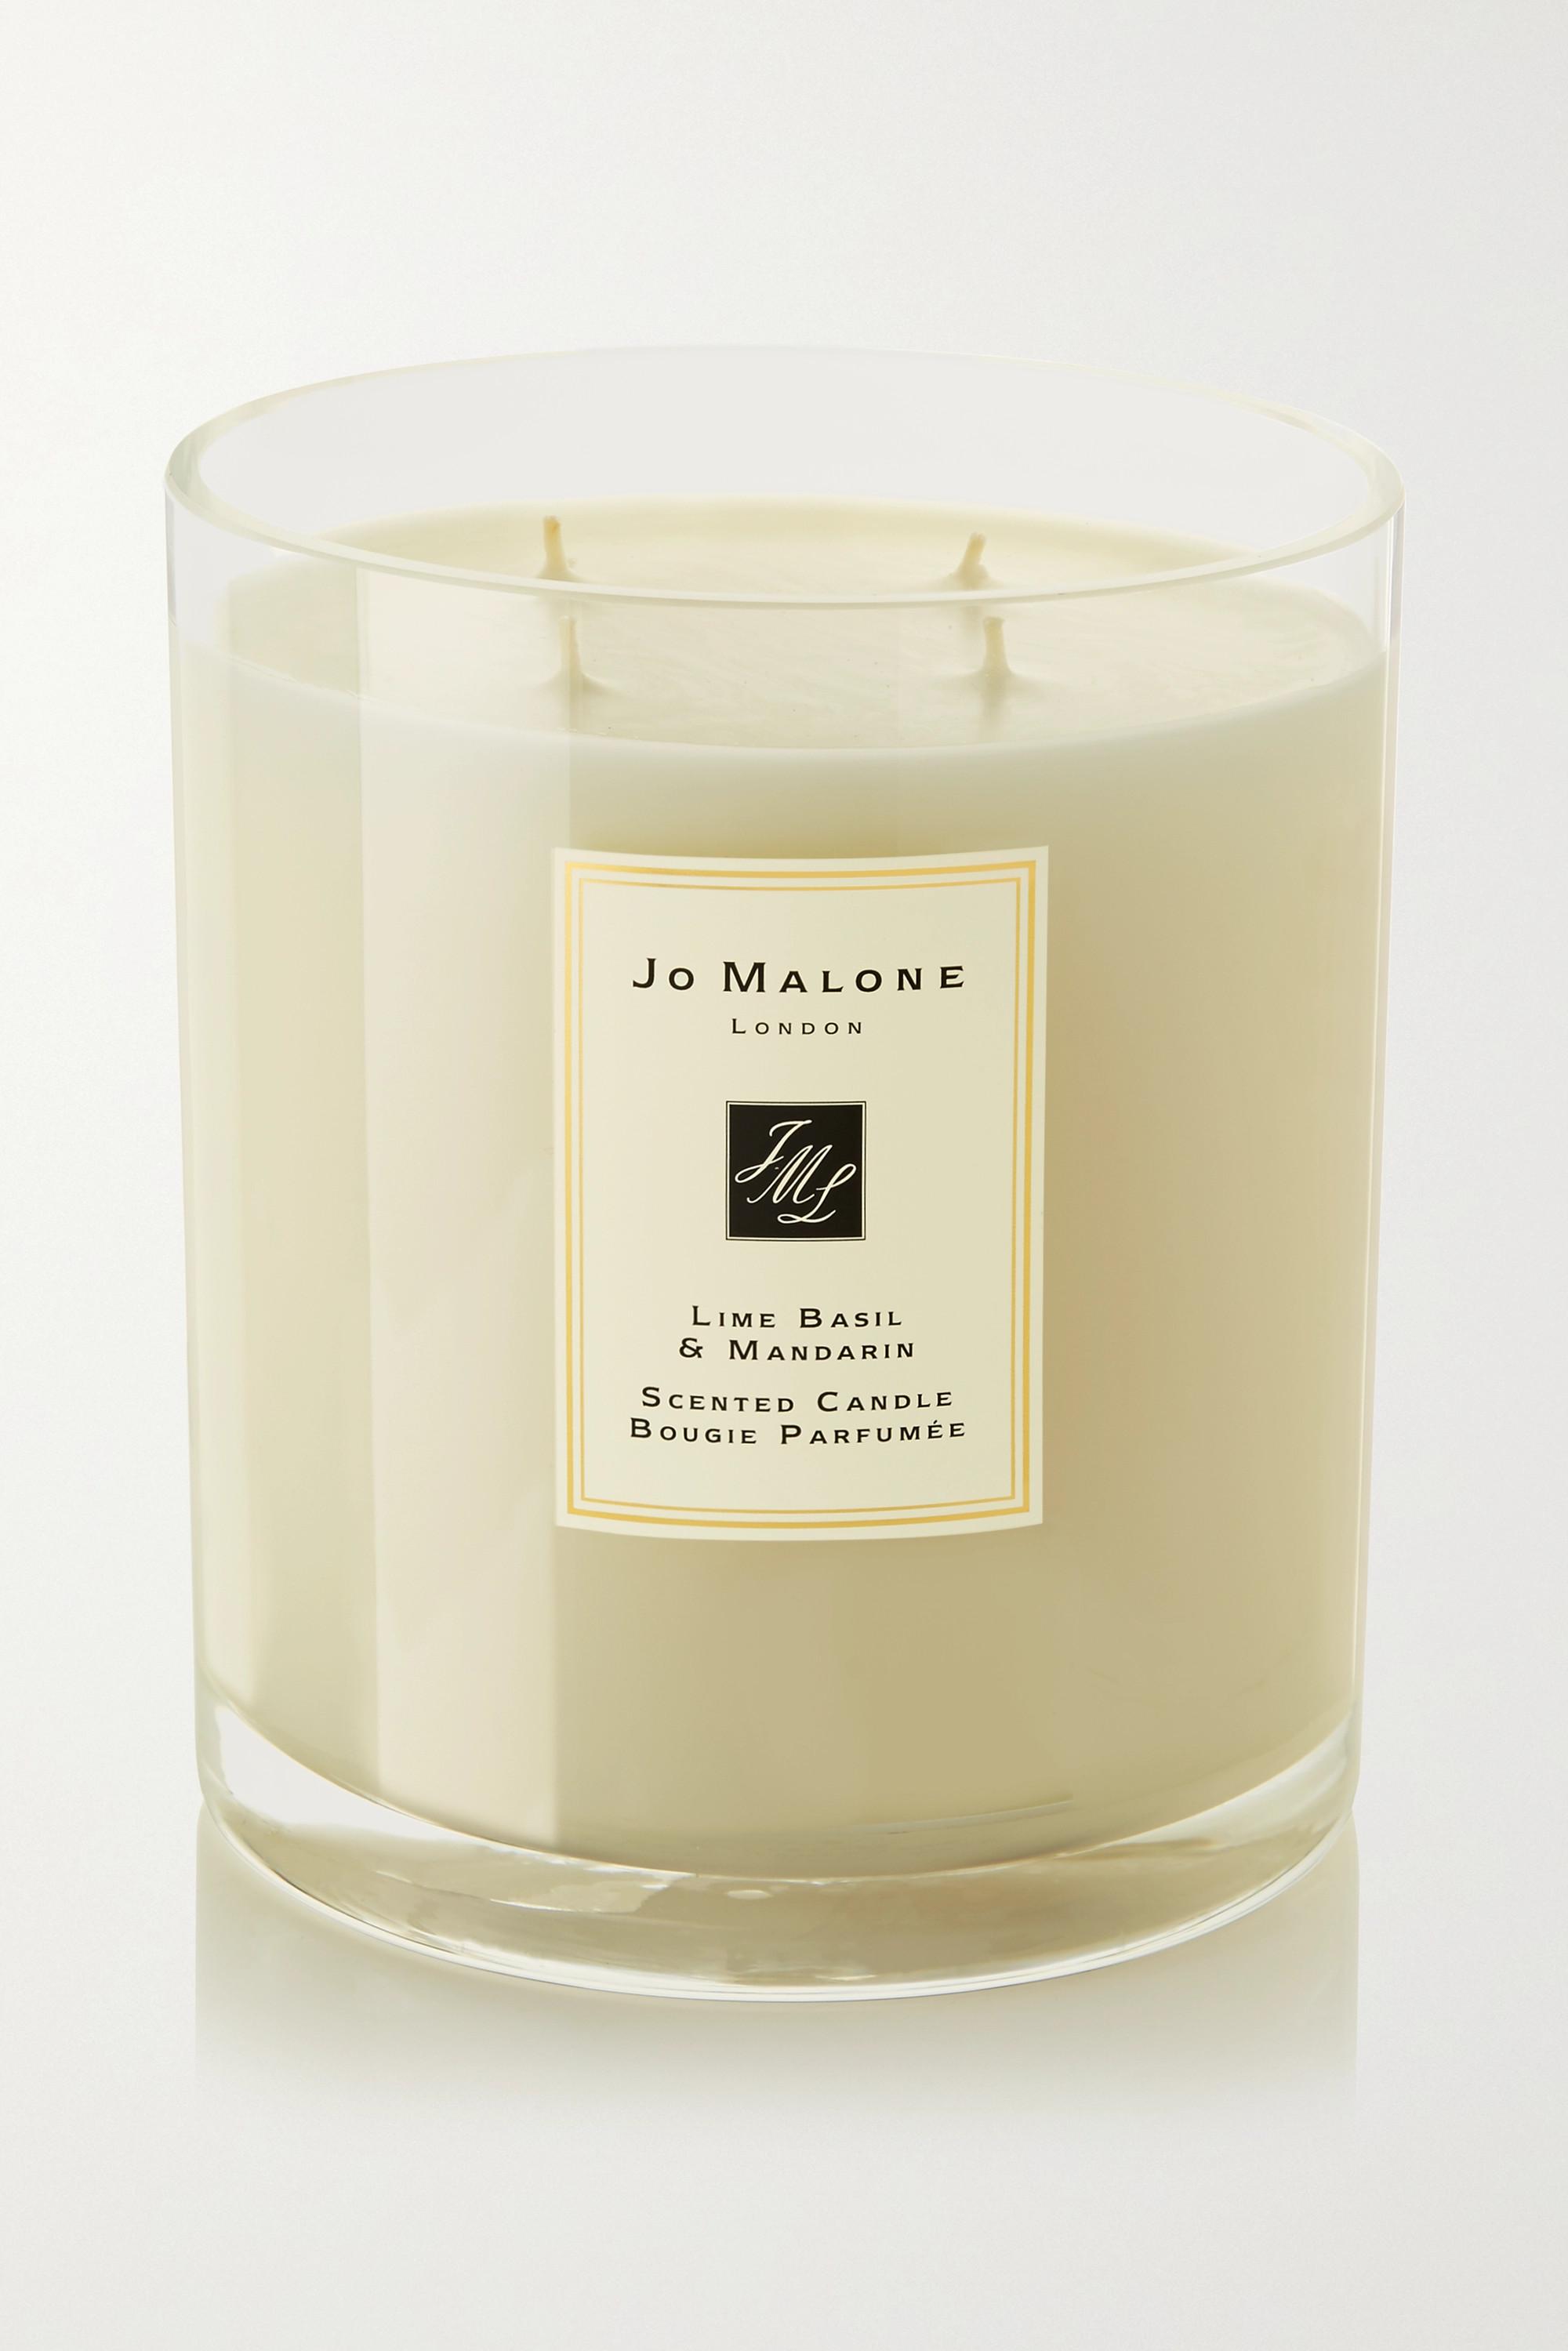 Jo Malone London Lime Basil & Mandarin Scented Luxury Candle, 2500g